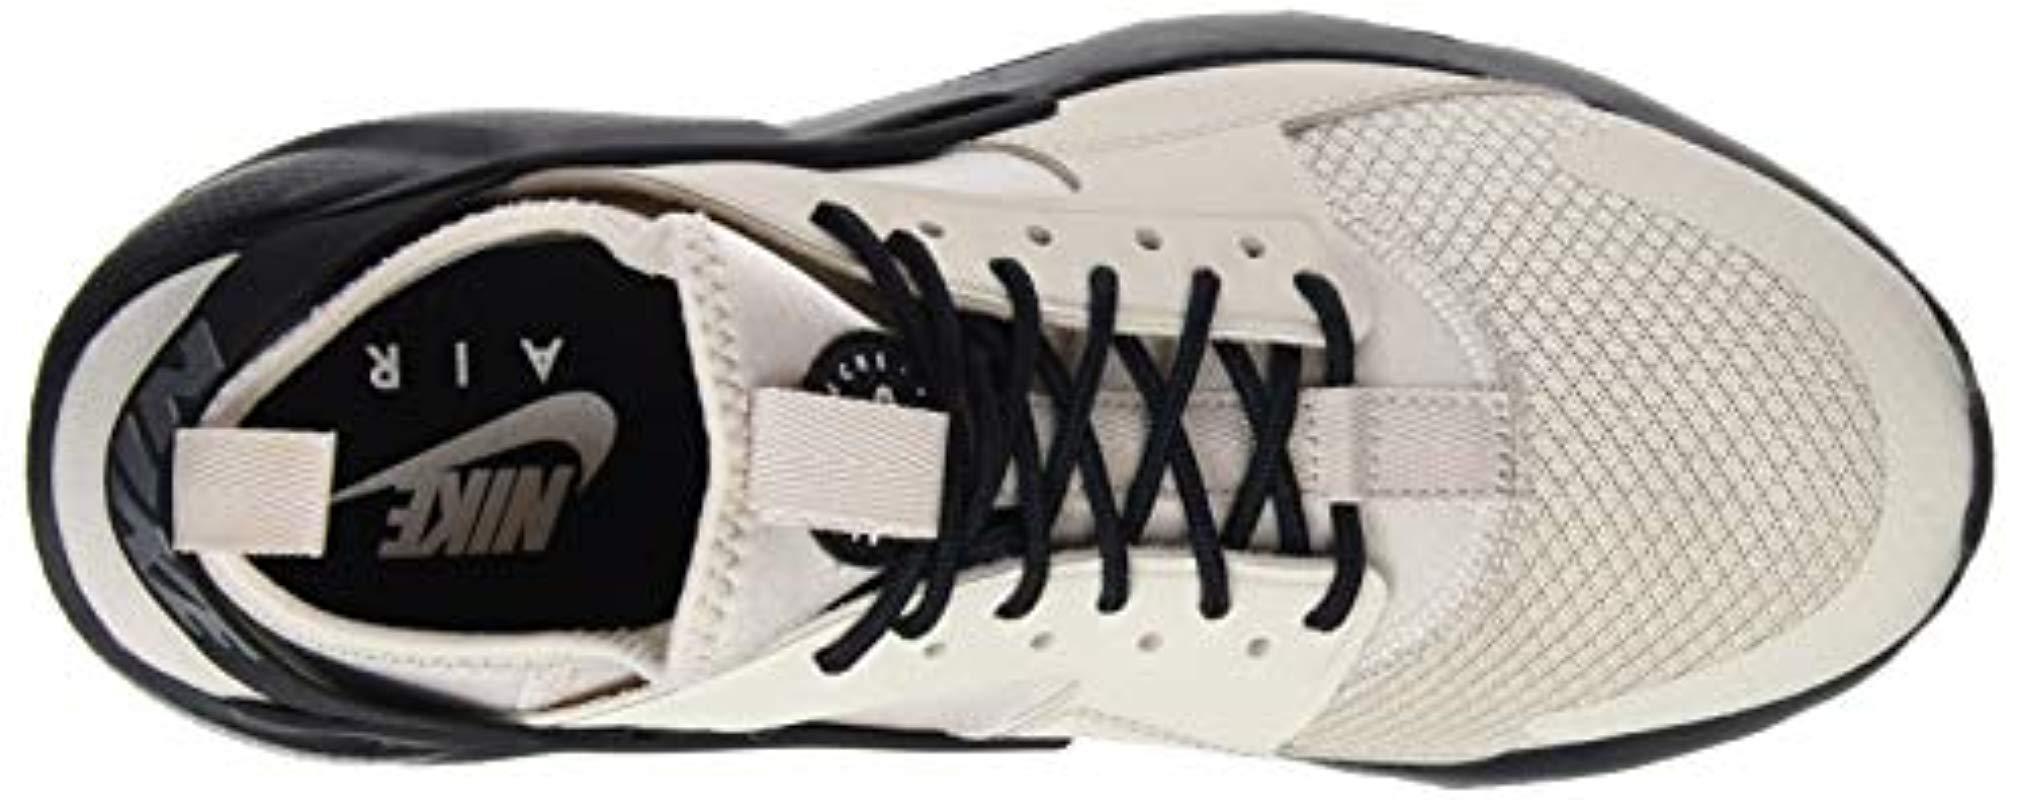 timeless design 3e71c ce4d0 Nike Air Huarache Run Ultra Fitness Shoes, Multicolour (desert Sand ...